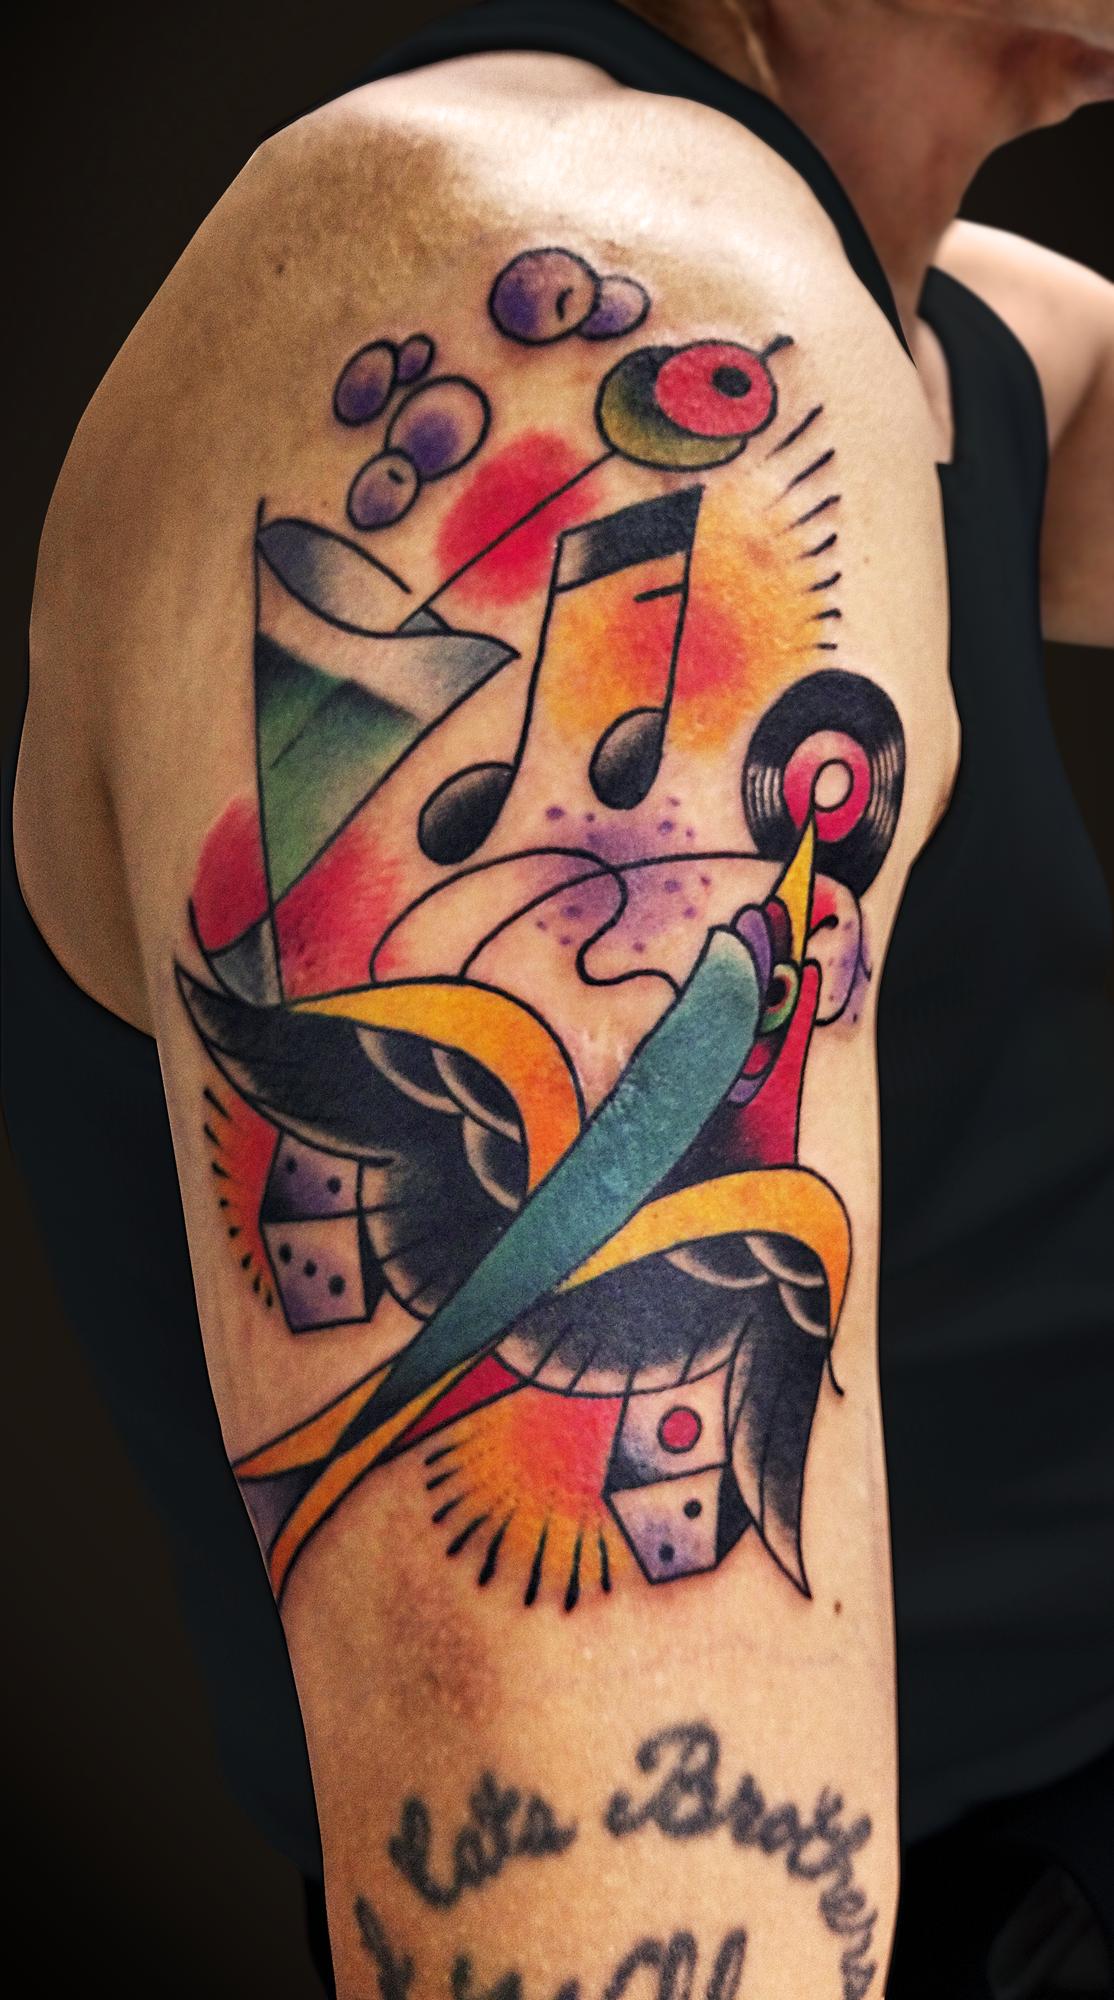 KING RAT TATTOO 作品 | LAVA gallery | Tattoo artist: Yuji Anai | キングラット | ラバギャラリー | タトゥーアート | 福岡県北九州市 | KIMG0128_2